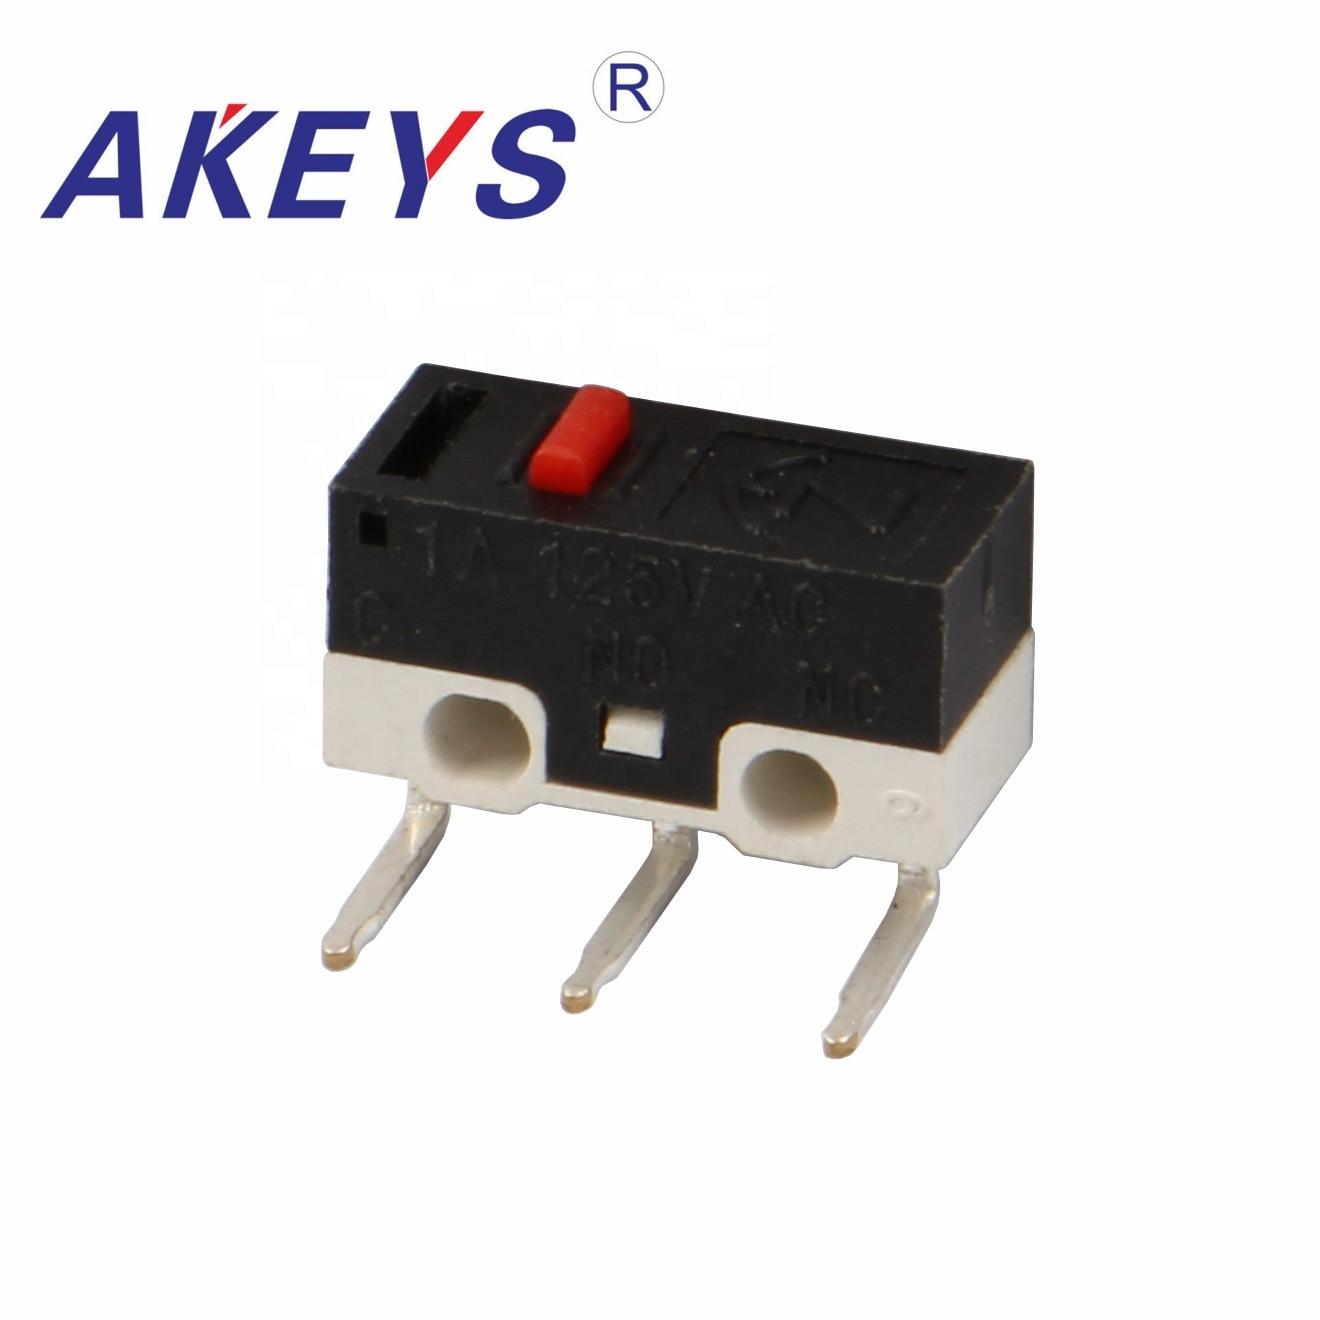 20 Pcs Ms-009 Jl006 Hot Selling Micro Schakelaar Met 3 Gebogen Pin En Wiel Snelle Warmteafvoer